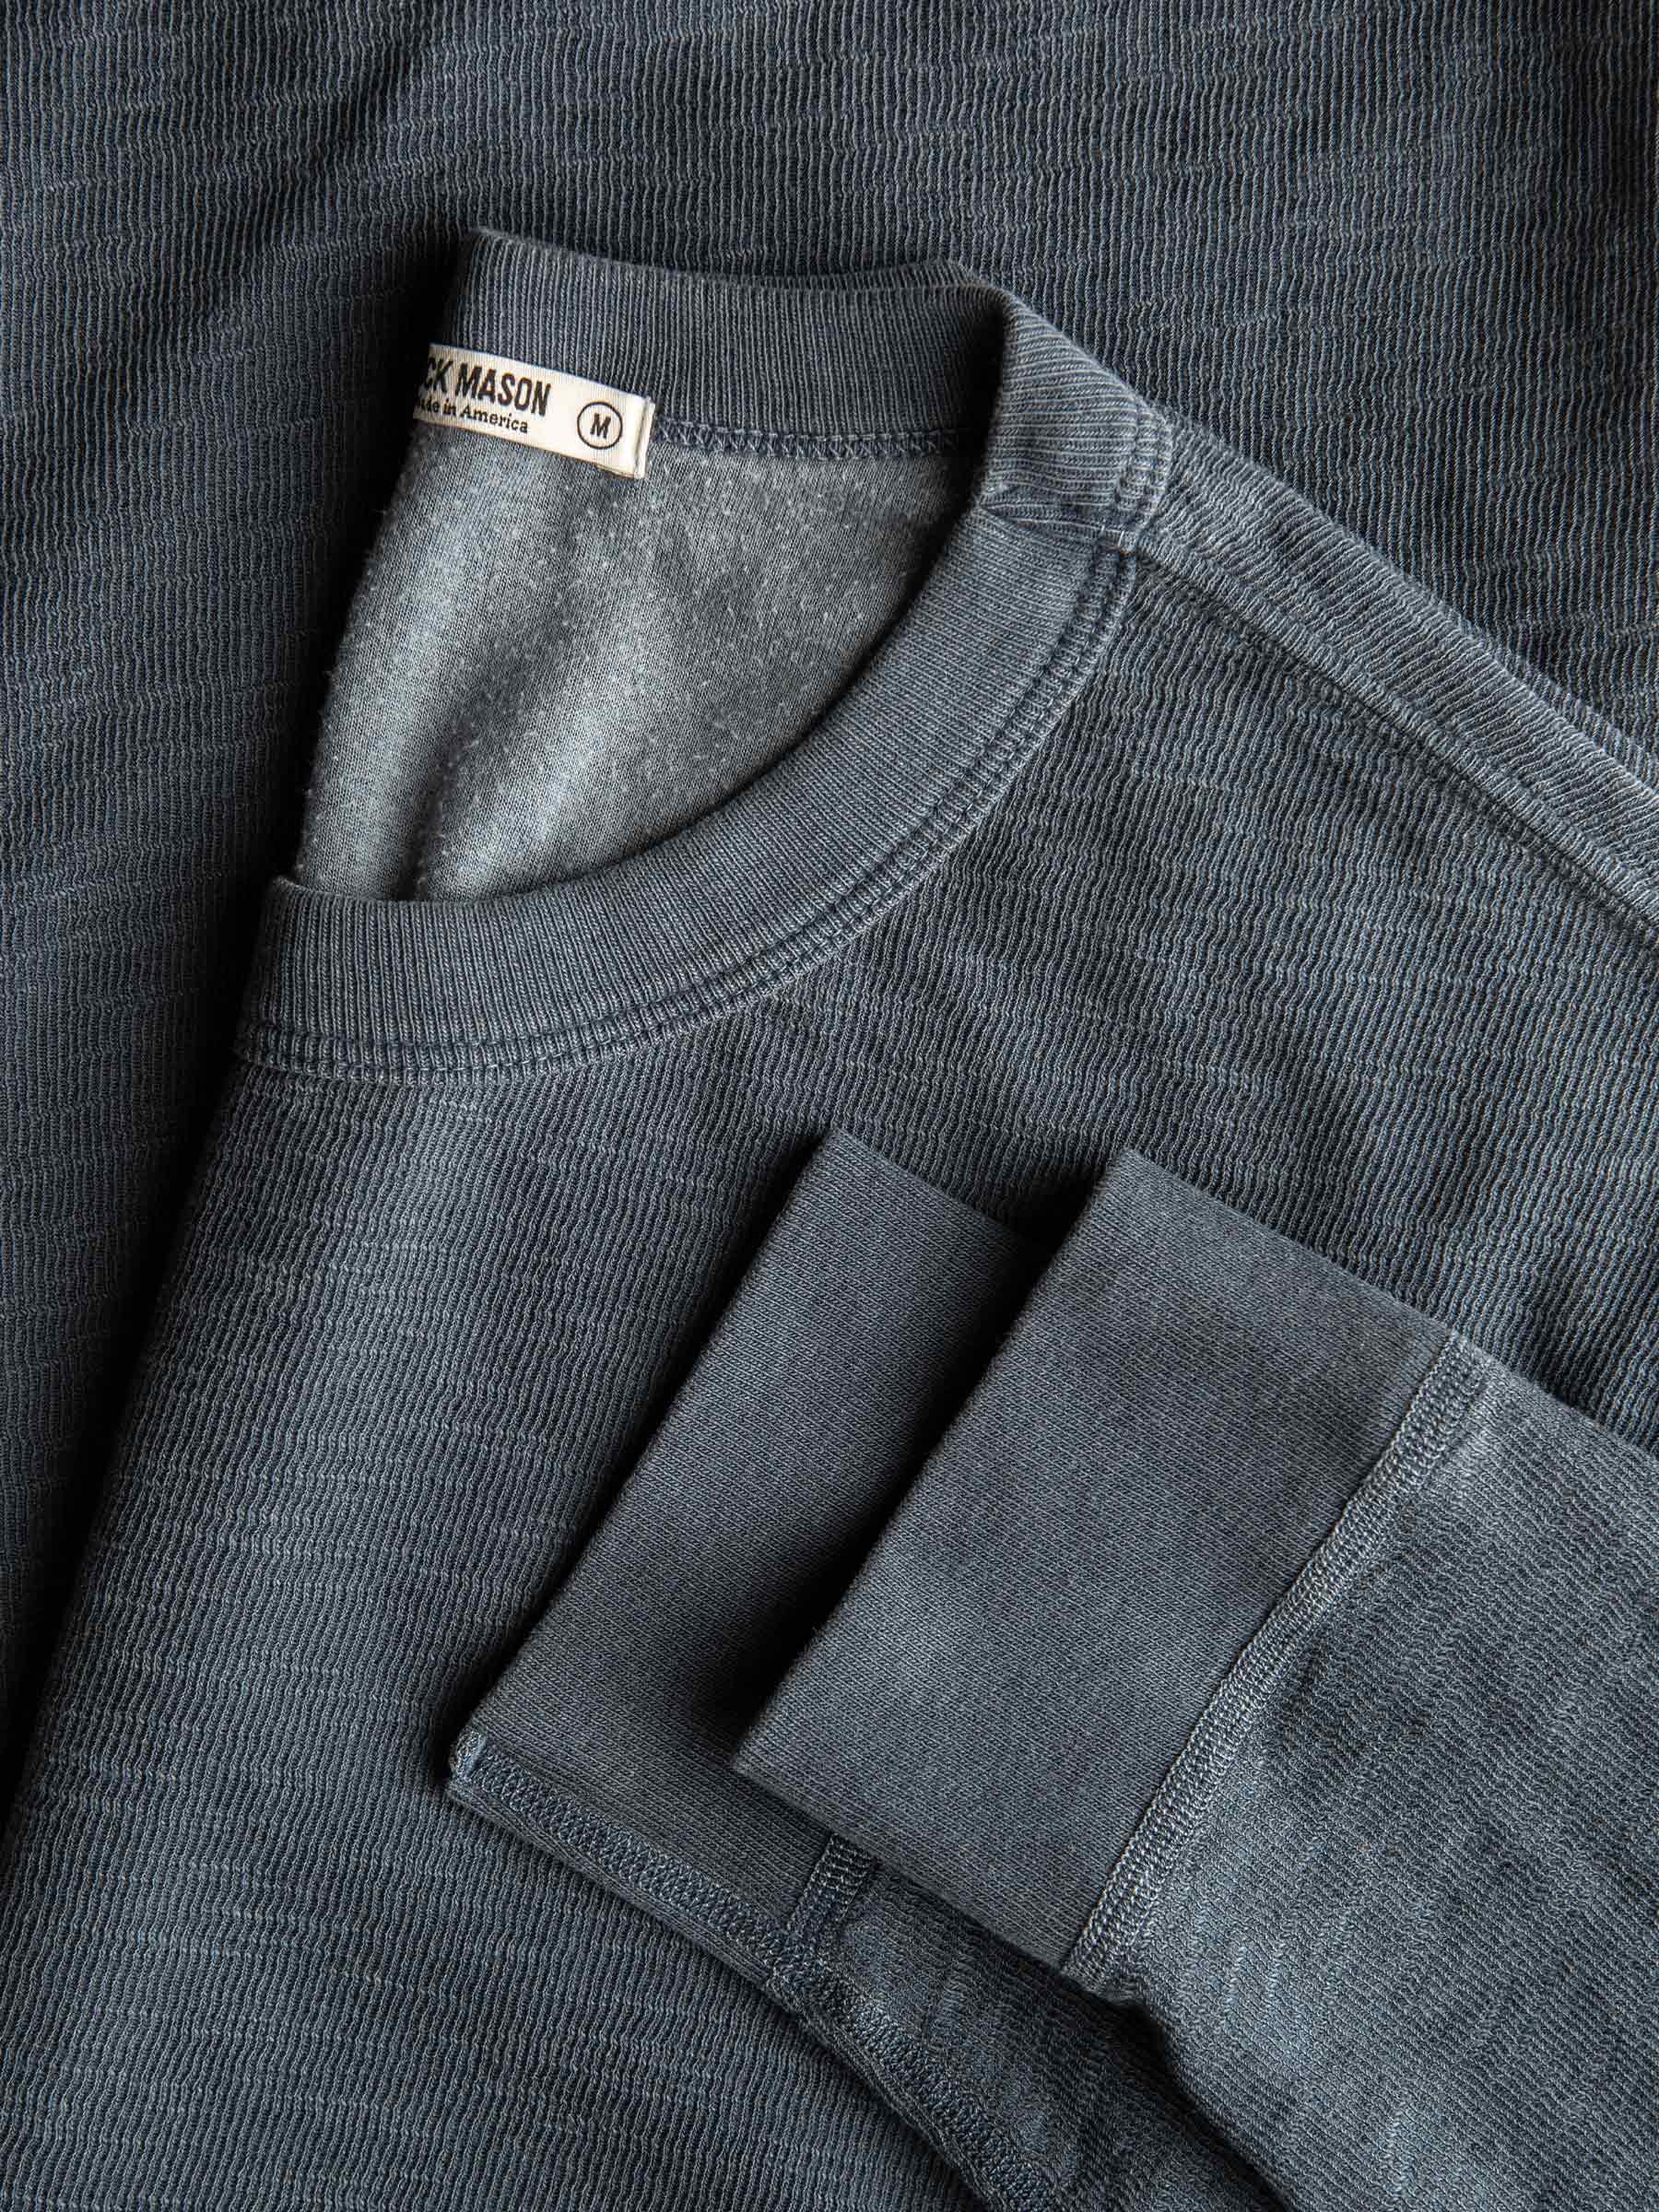 Buck Mason - Loma Venice Wash Lightweight Double Slub Sweatshirt